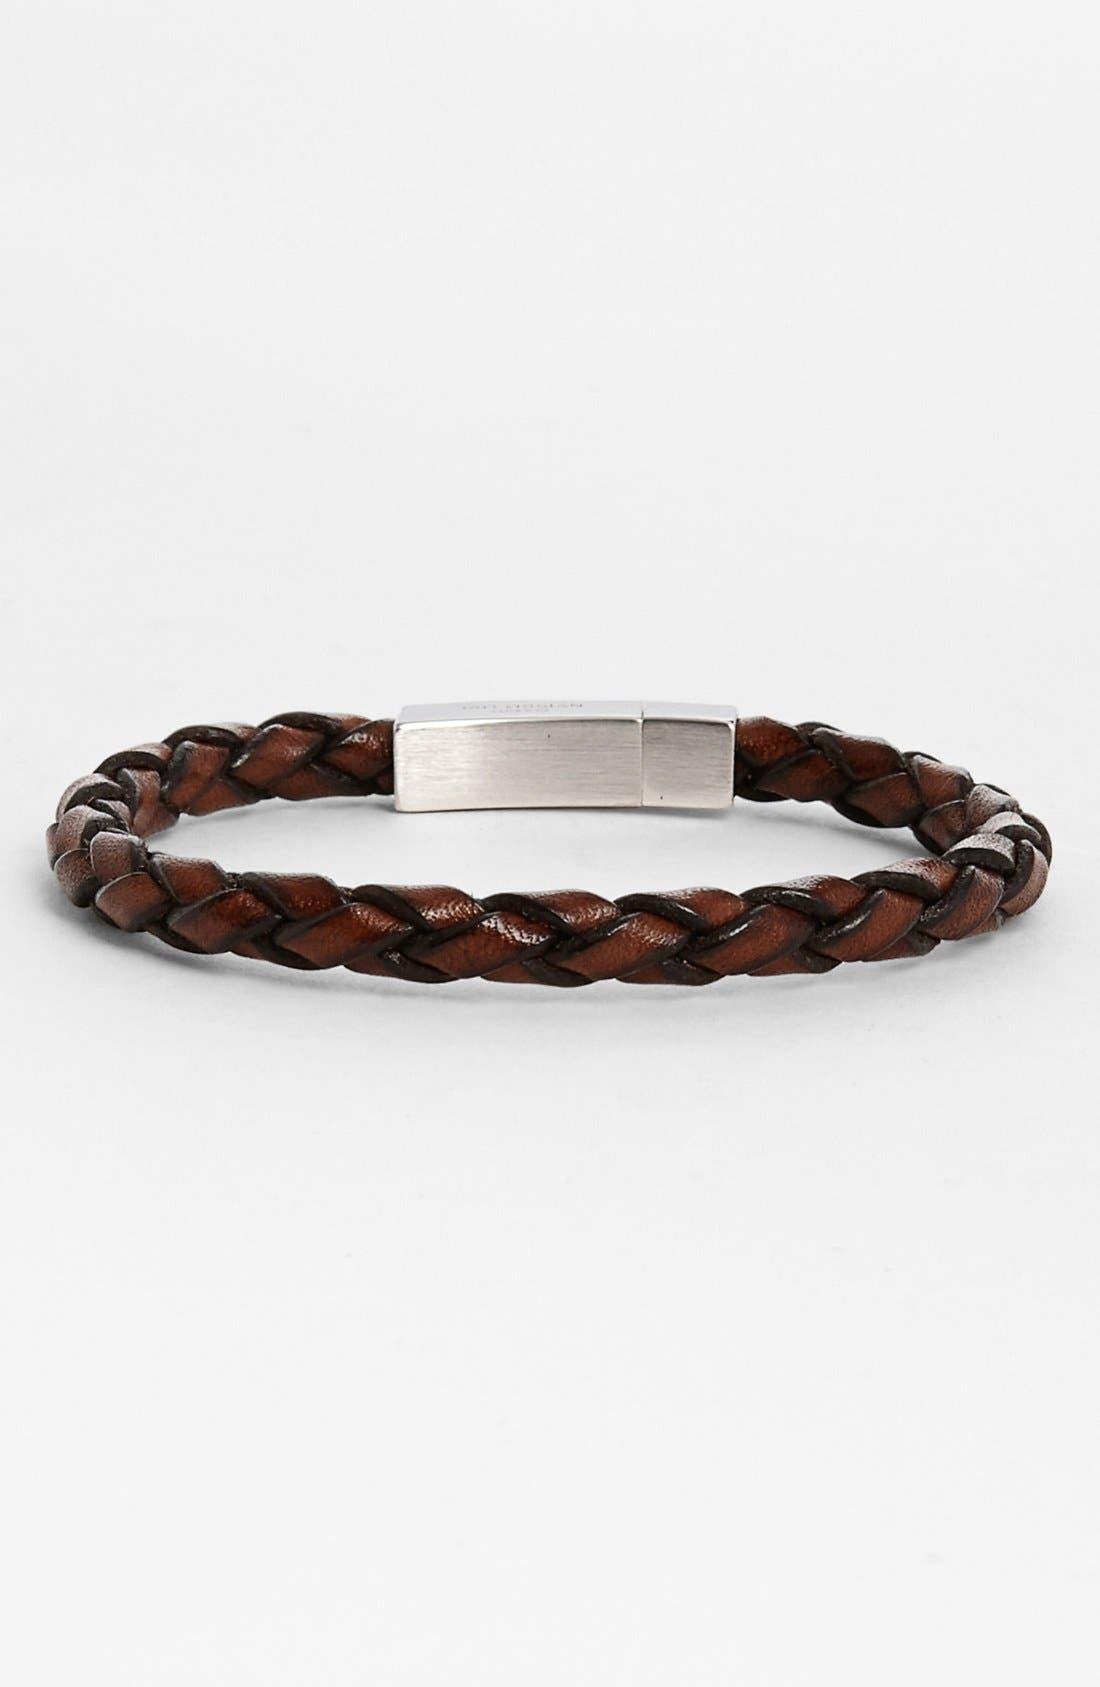 Scoubidou Bracelet,                             Main thumbnail 1, color,                             Brown